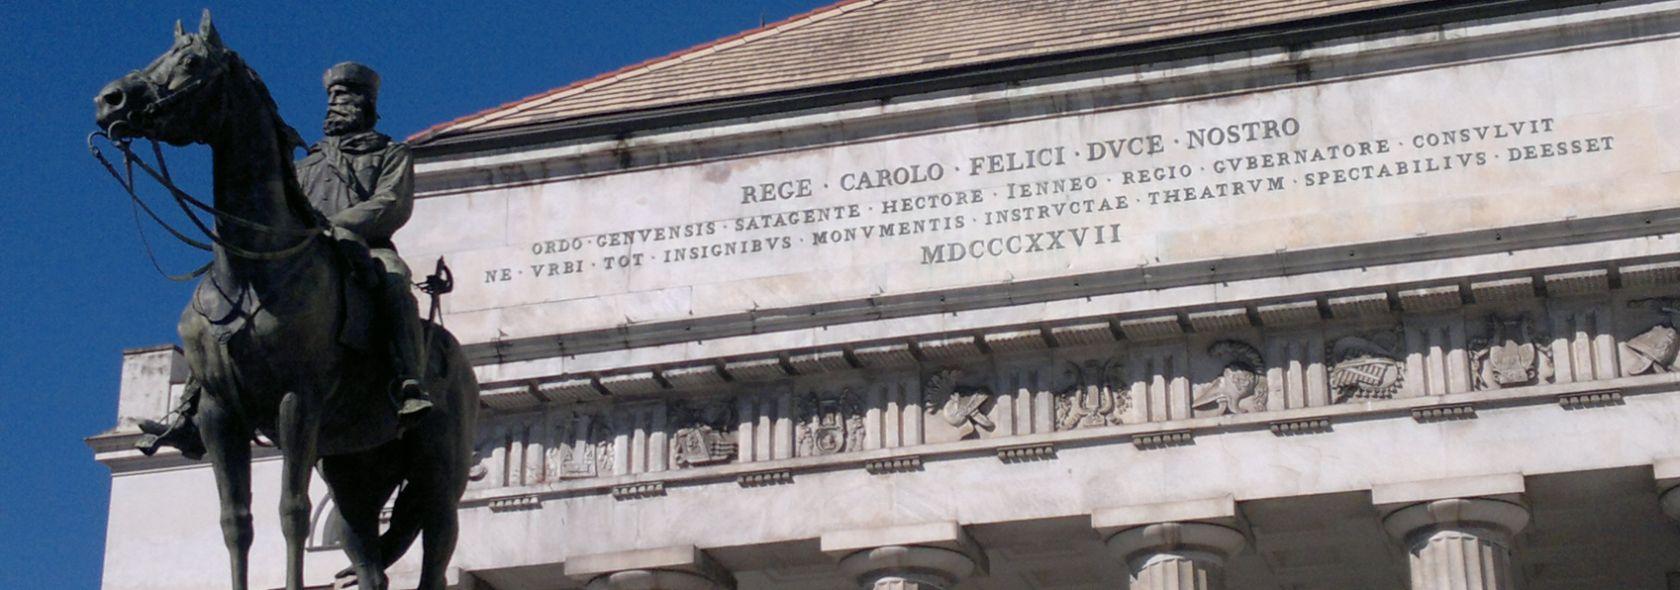 Il Teatro Carlo Felice - frontone